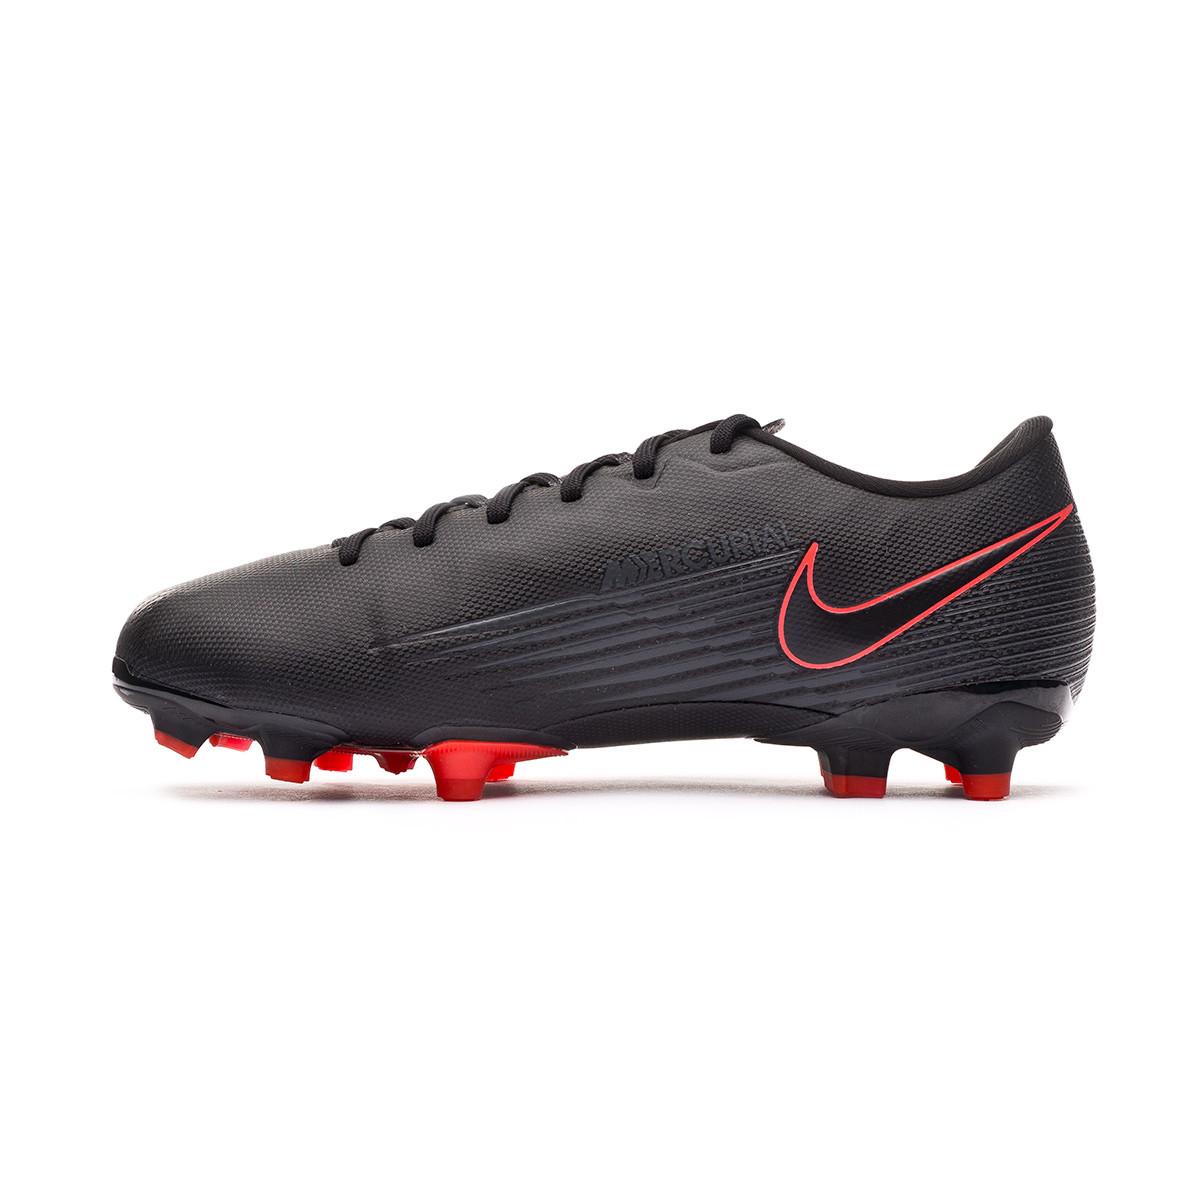 Chaussure de foot Nike Mercurial Vapor XIII Academy FGMG Niño